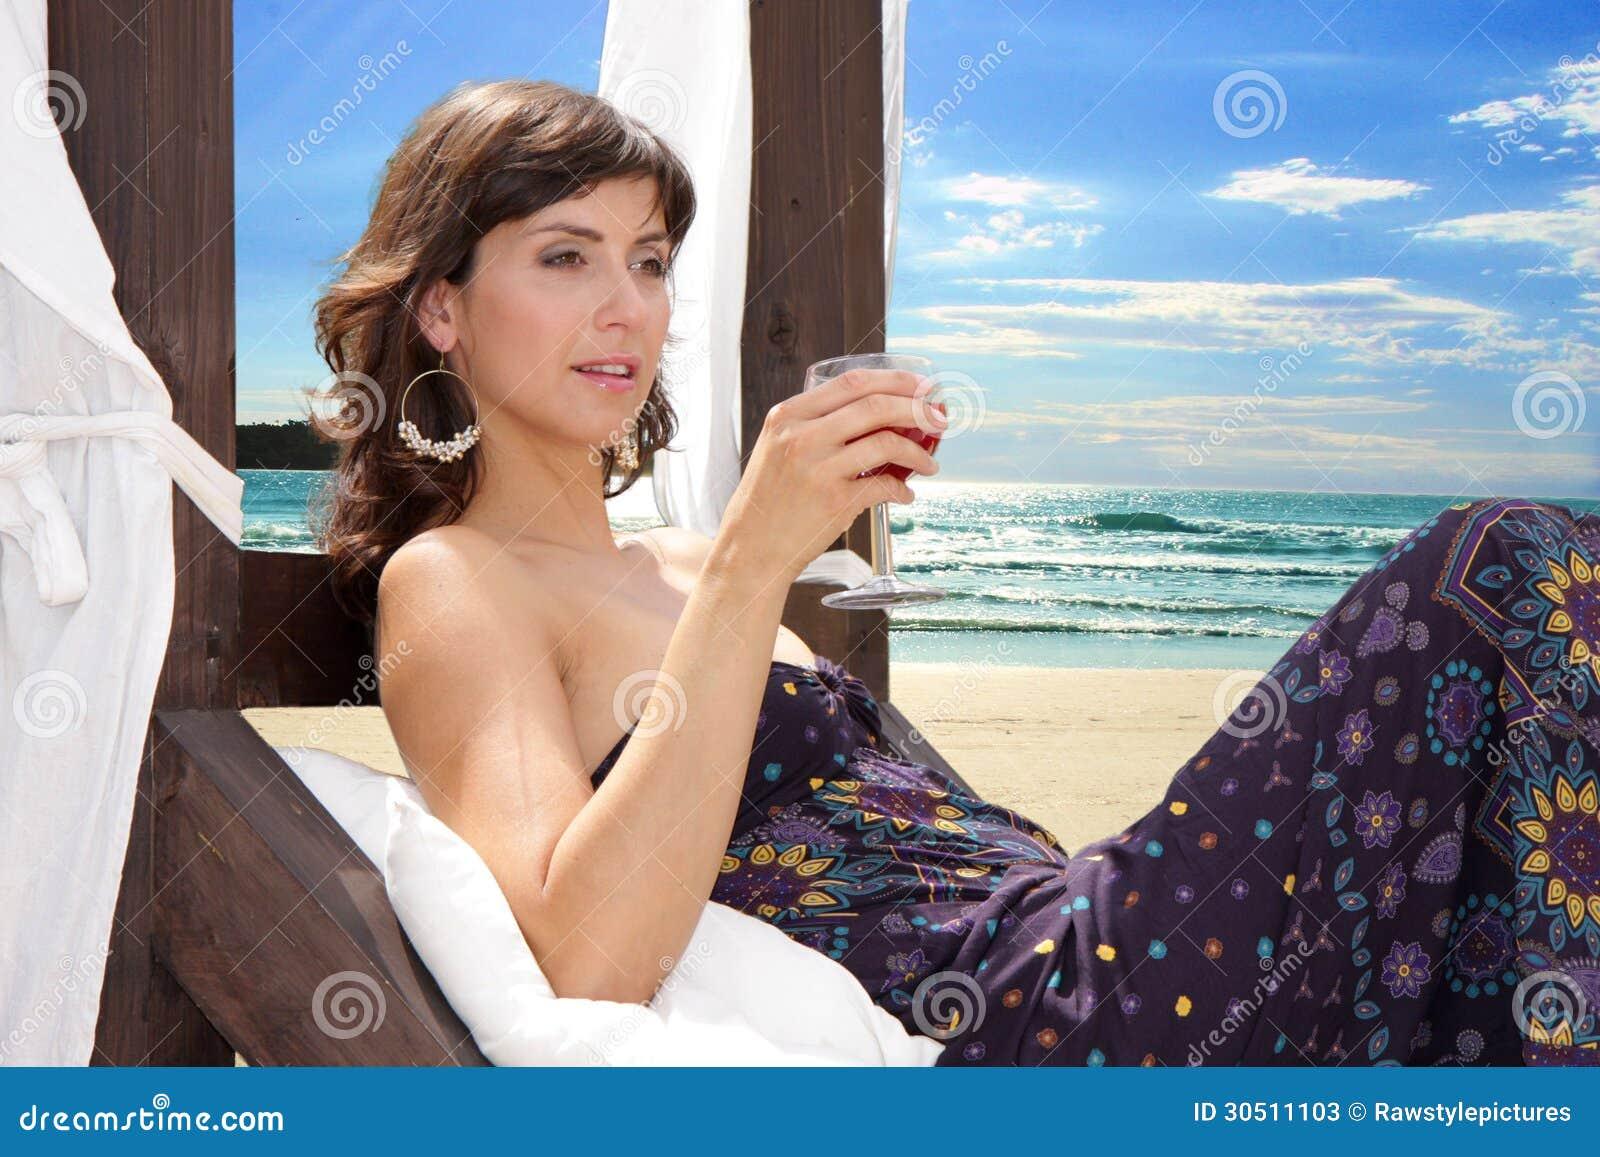 women having sex on the beach drink